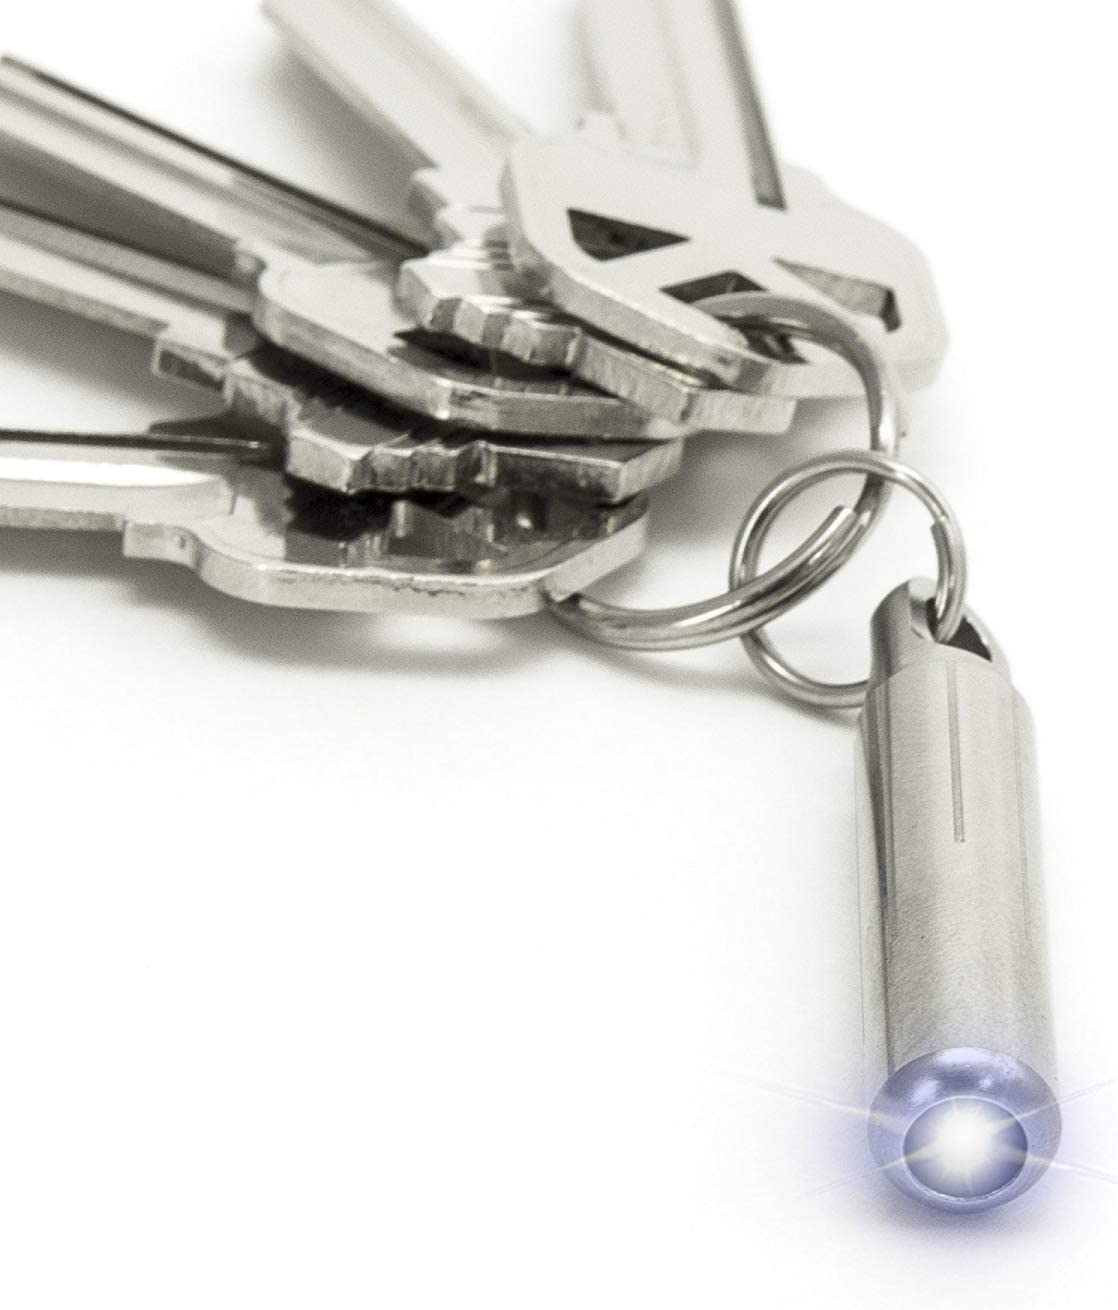 FREE Titanium Keychain Batteries INCLUDED Micro Flashlight 100 Lumens